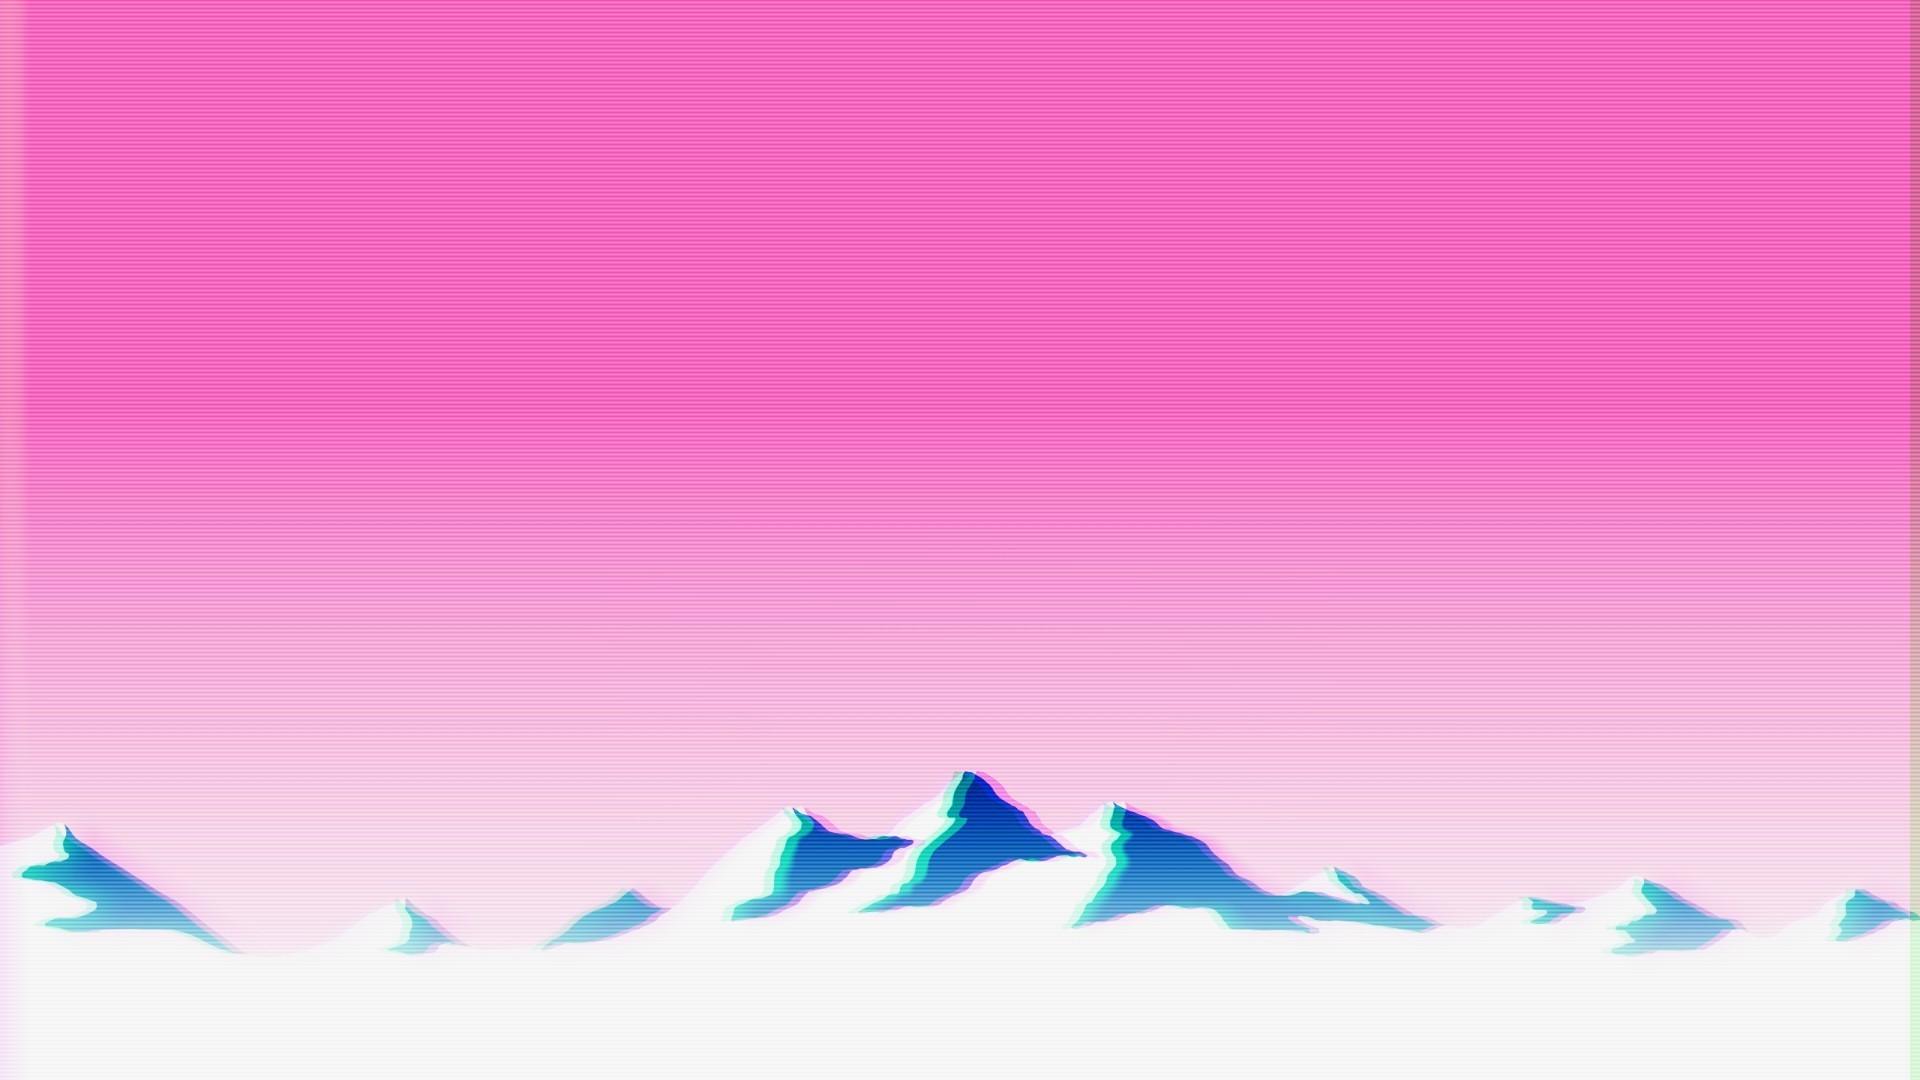 Vaporwave Background Download Free Stunning High Resolution